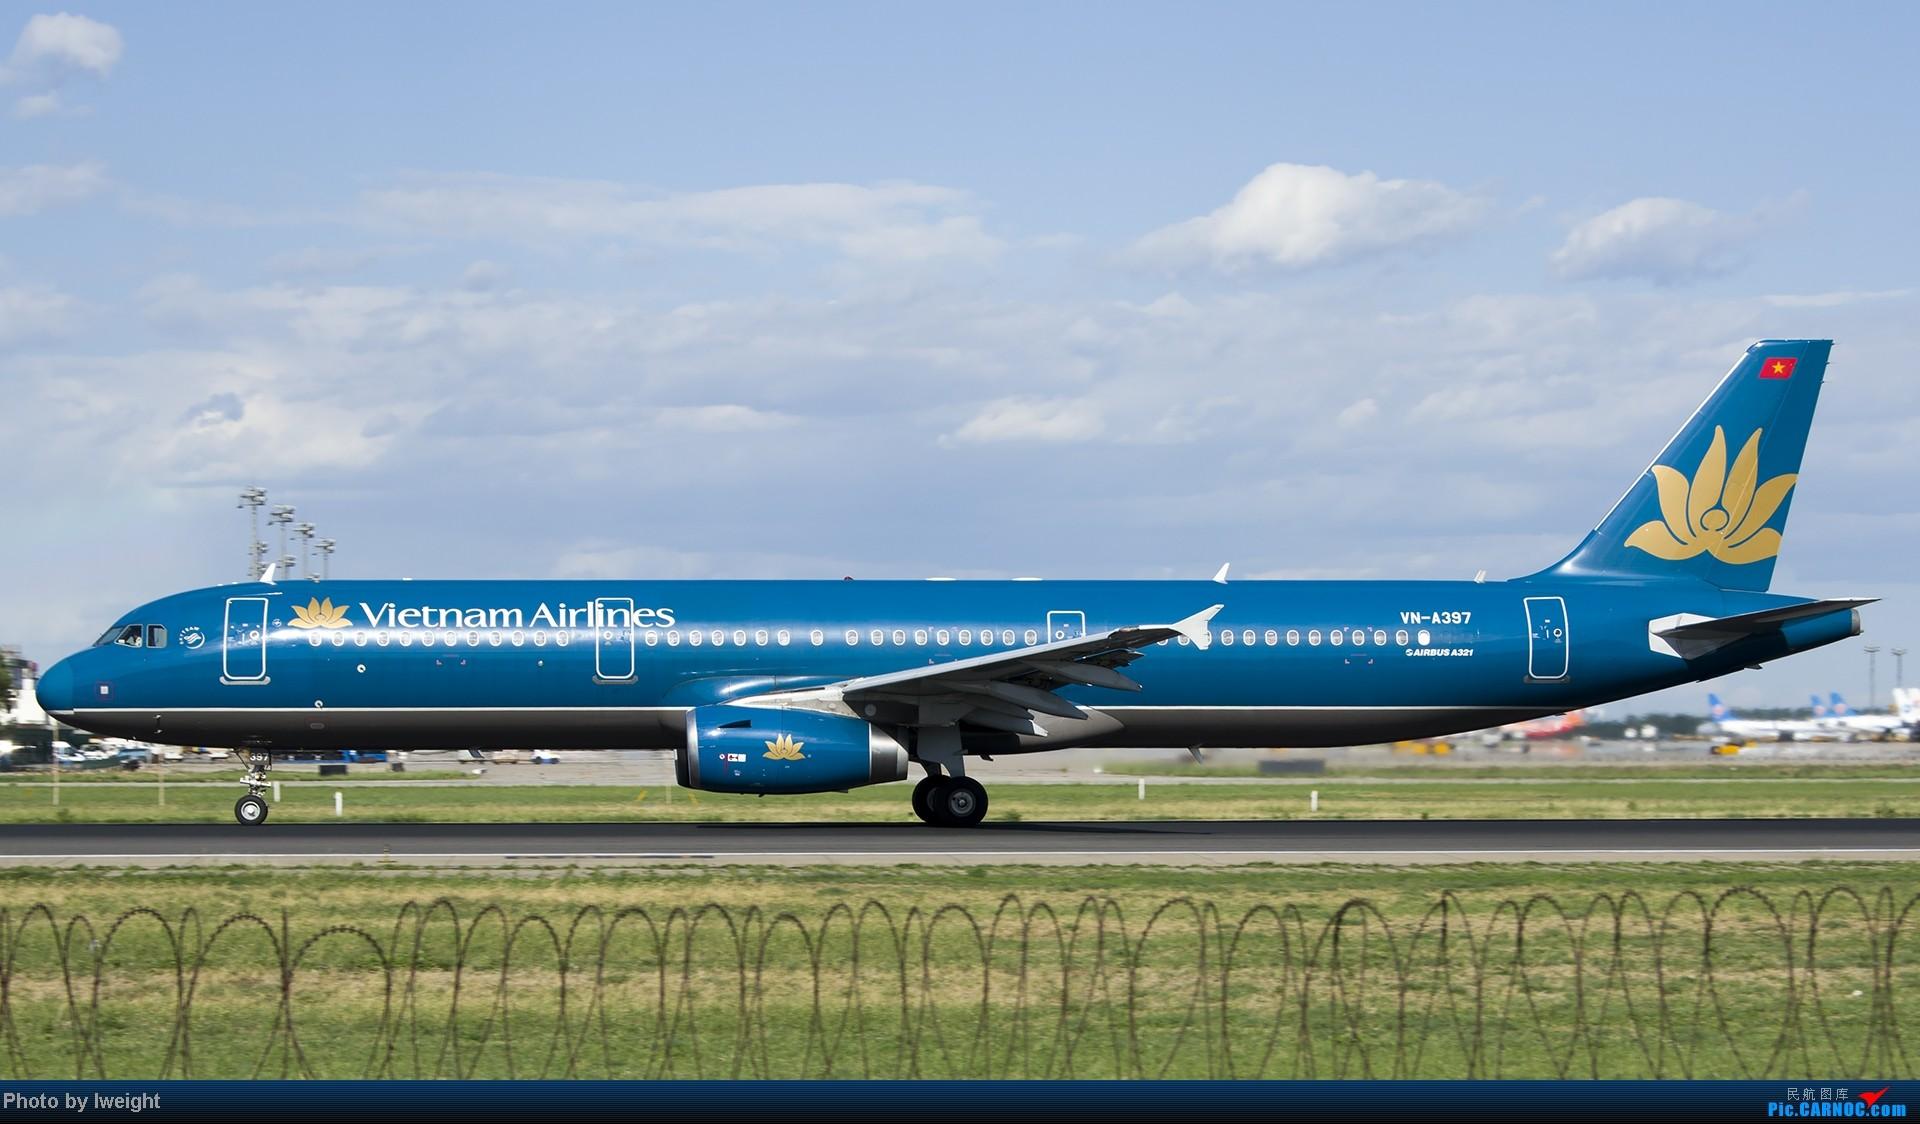 Re:[原创]新相机+好天气,PEK试机乱拍 AIRBUS A321-200 VN-A397 中国北京首都机场